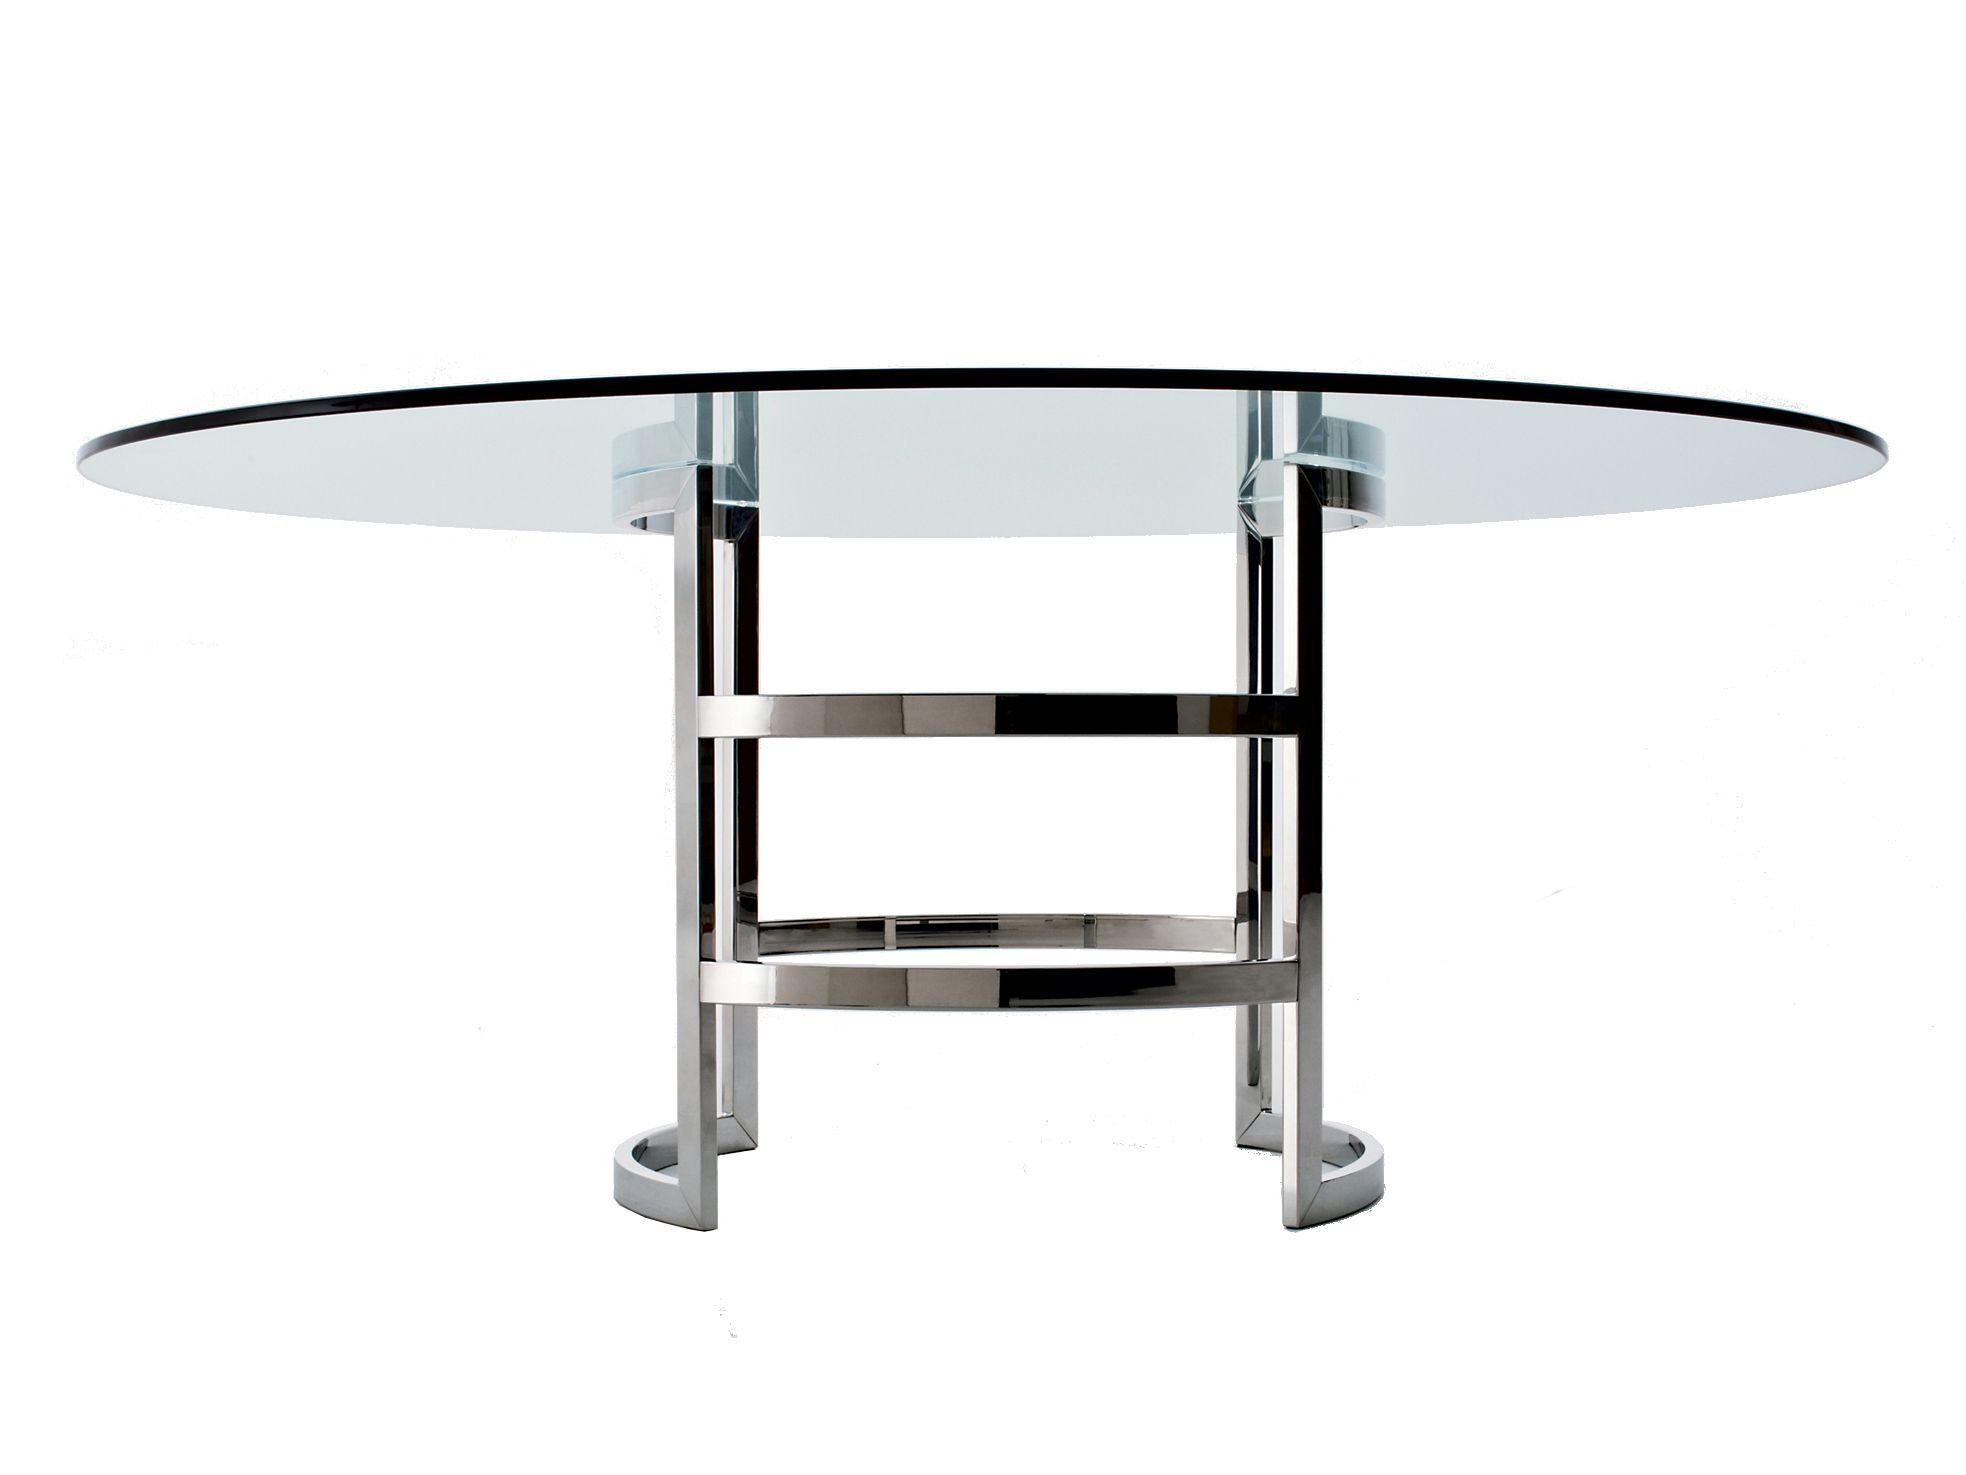 Mesa de cristal asia by gallotti radice dise o ricardo - Mesa cristal diseno ...